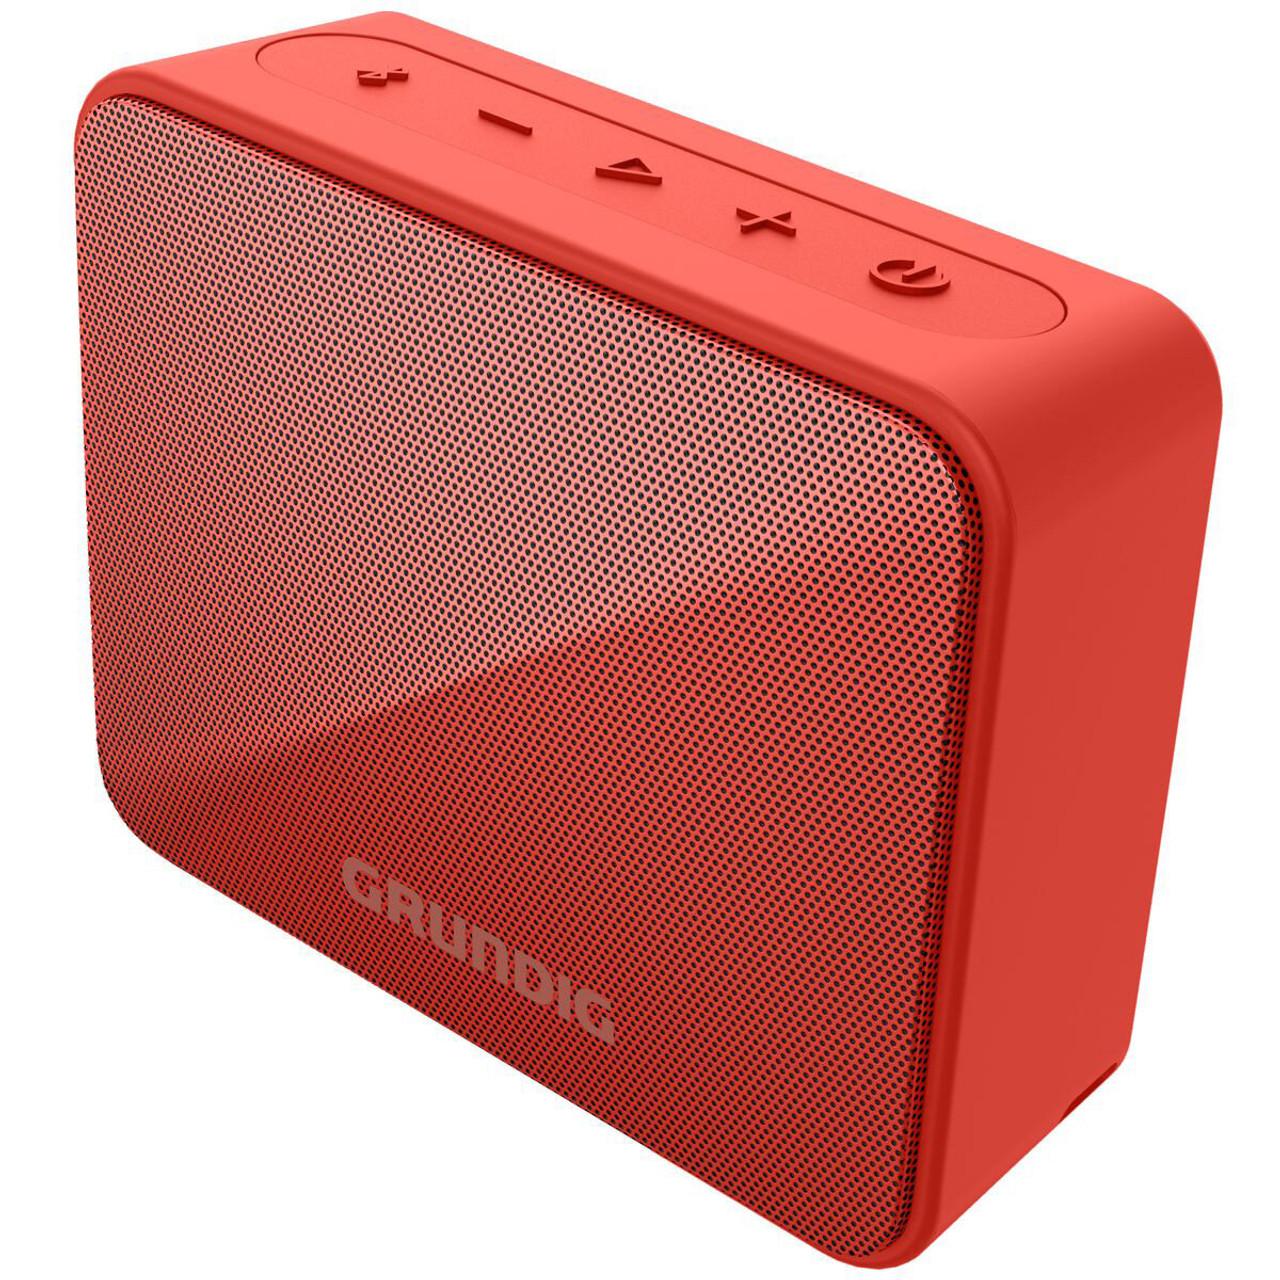 Grundig GLR7751 GBT Solo Waterproof Bluetooth Speaker - Coral